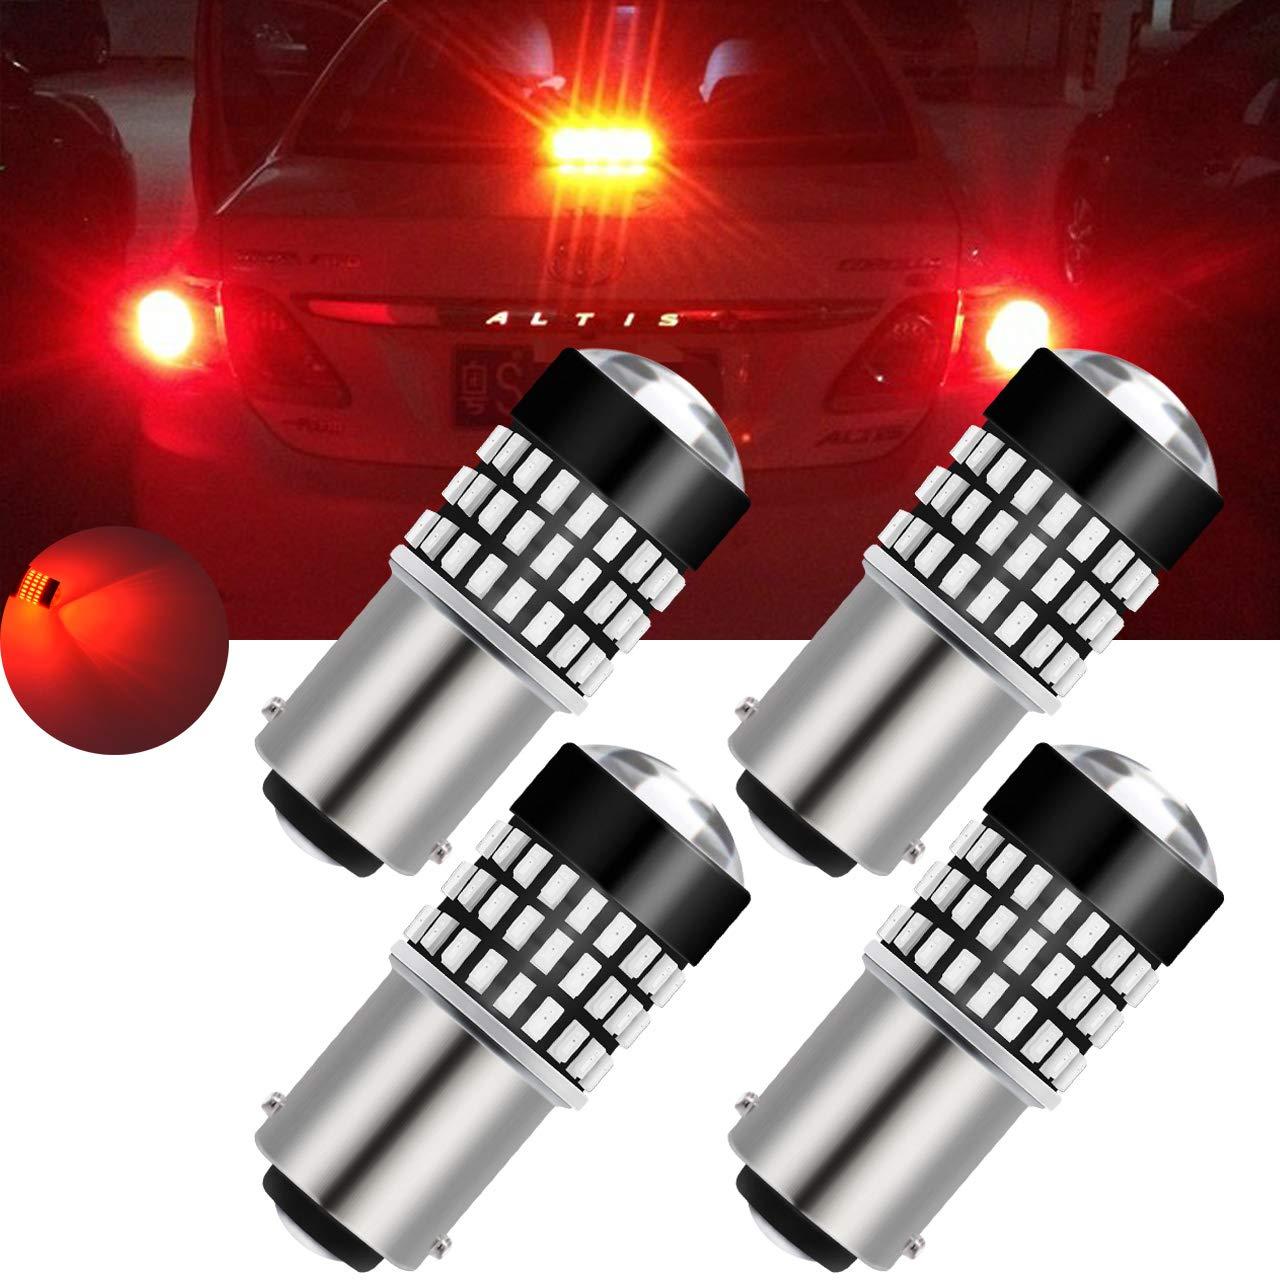 TUINCYN Red 900 Lumens 3157 3156 4057 3457 3057 3057A 3155 Base 3014 78SMD Lens LED Bulbs Turn Signal Tail Reverse Backup Brake LED Light DC 12V-24V 4W(2-Pack) BHBAZUALIn4921